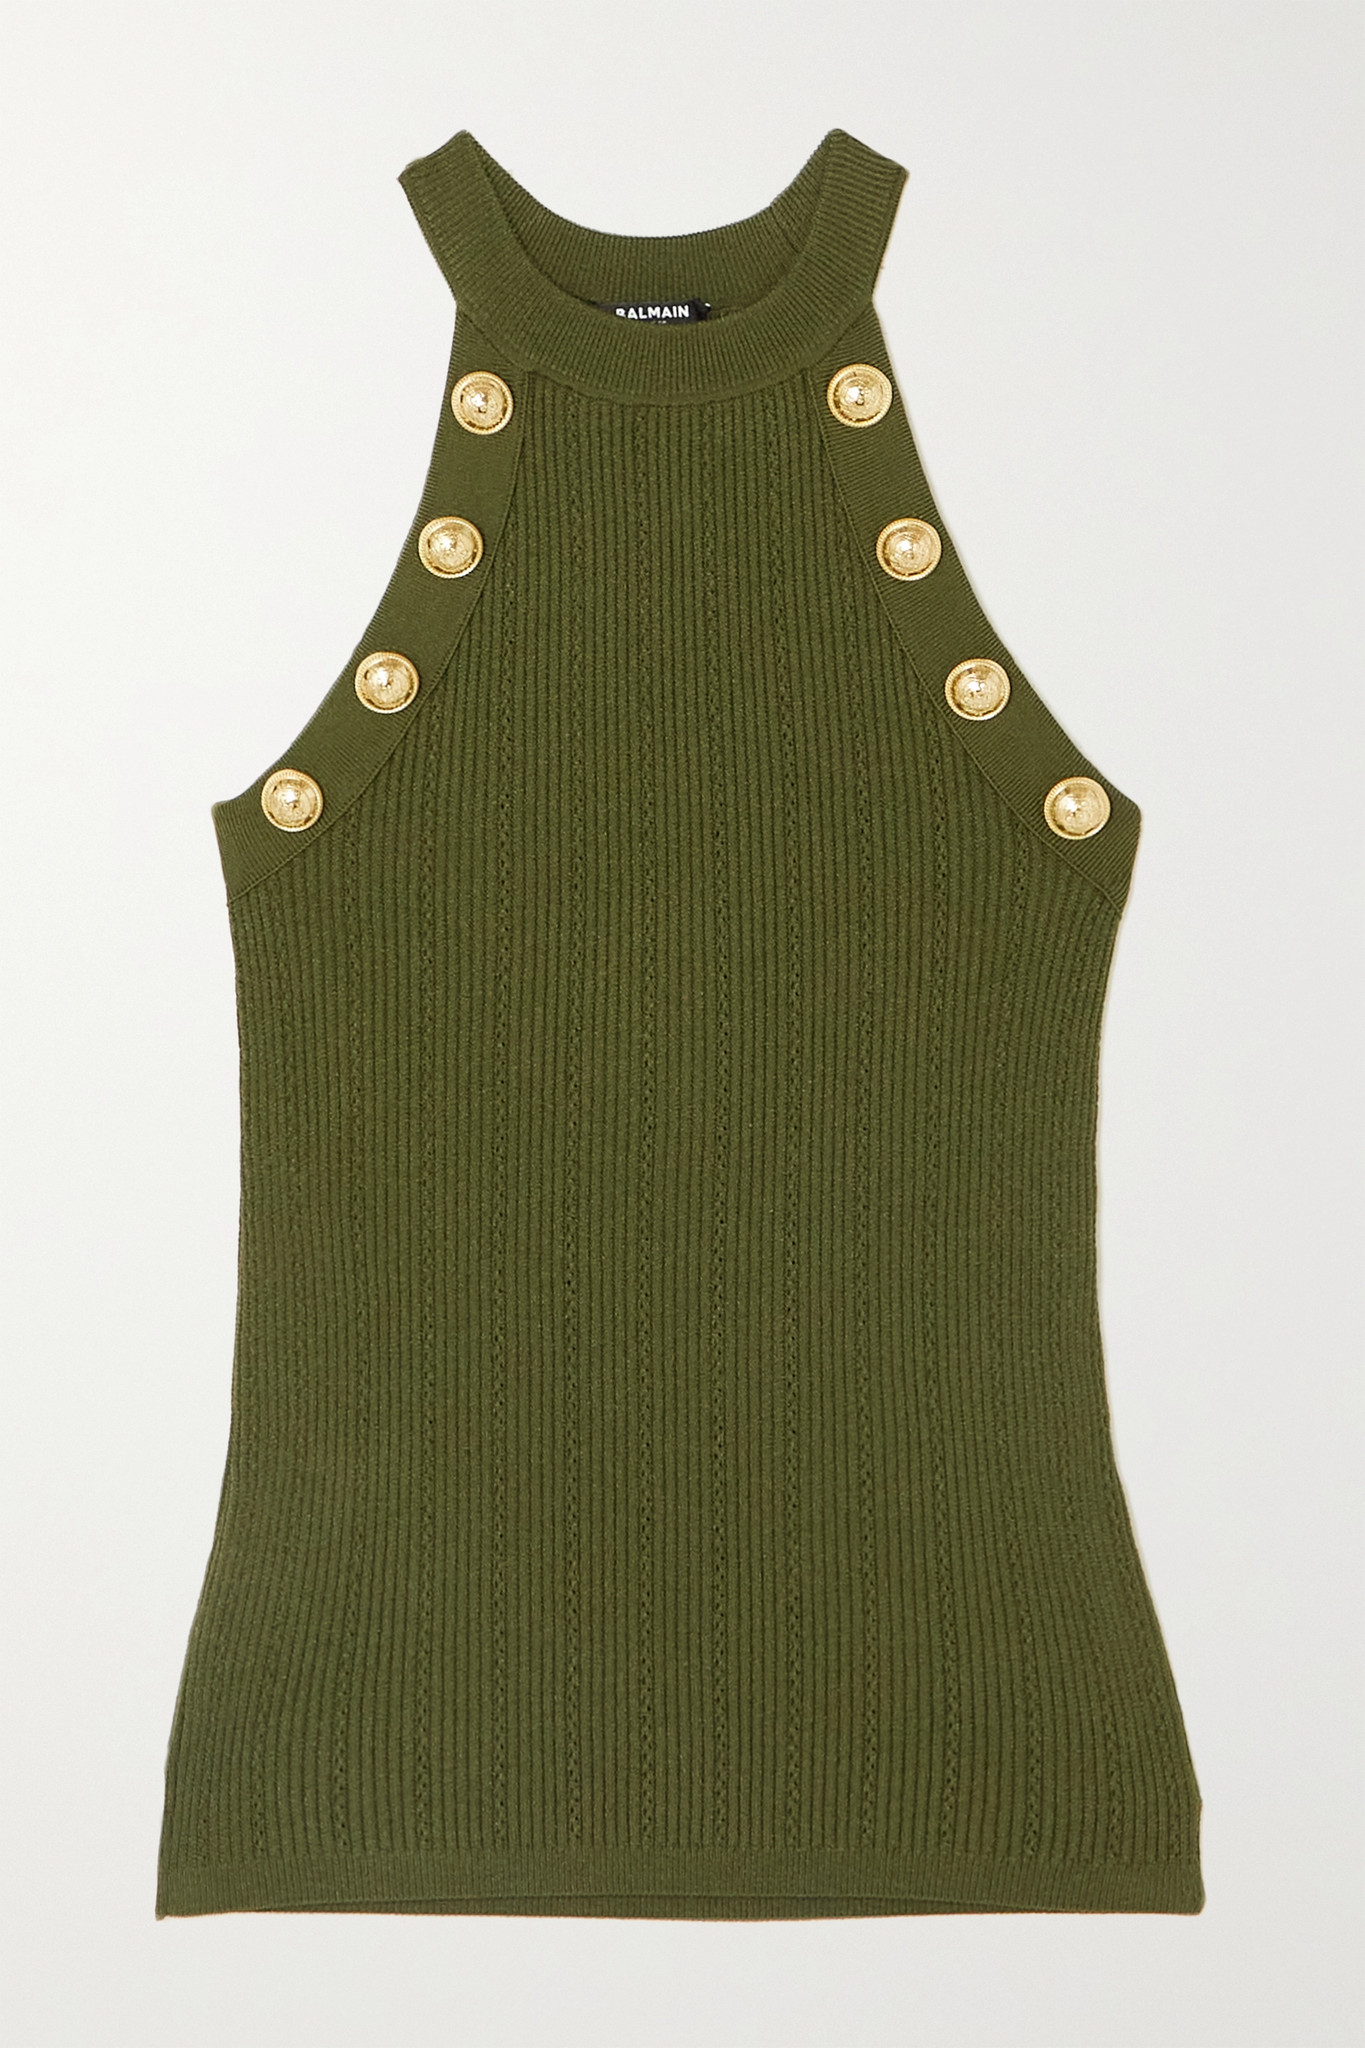 BALMAIN - Button-embellished Ribbed-knit Tank - Green - FR38